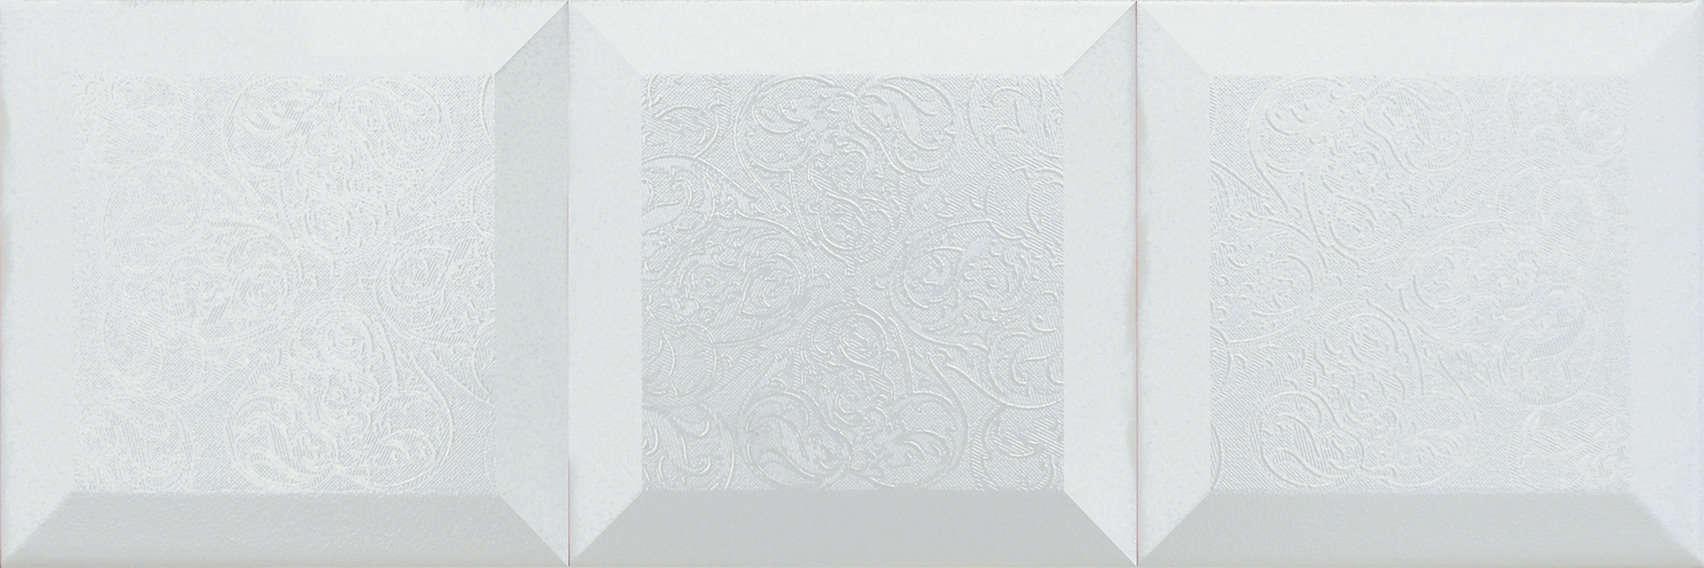 Faianță pentru baie Absolut Keramika Vintage Decor Blanco 150x450 satin alb / 15